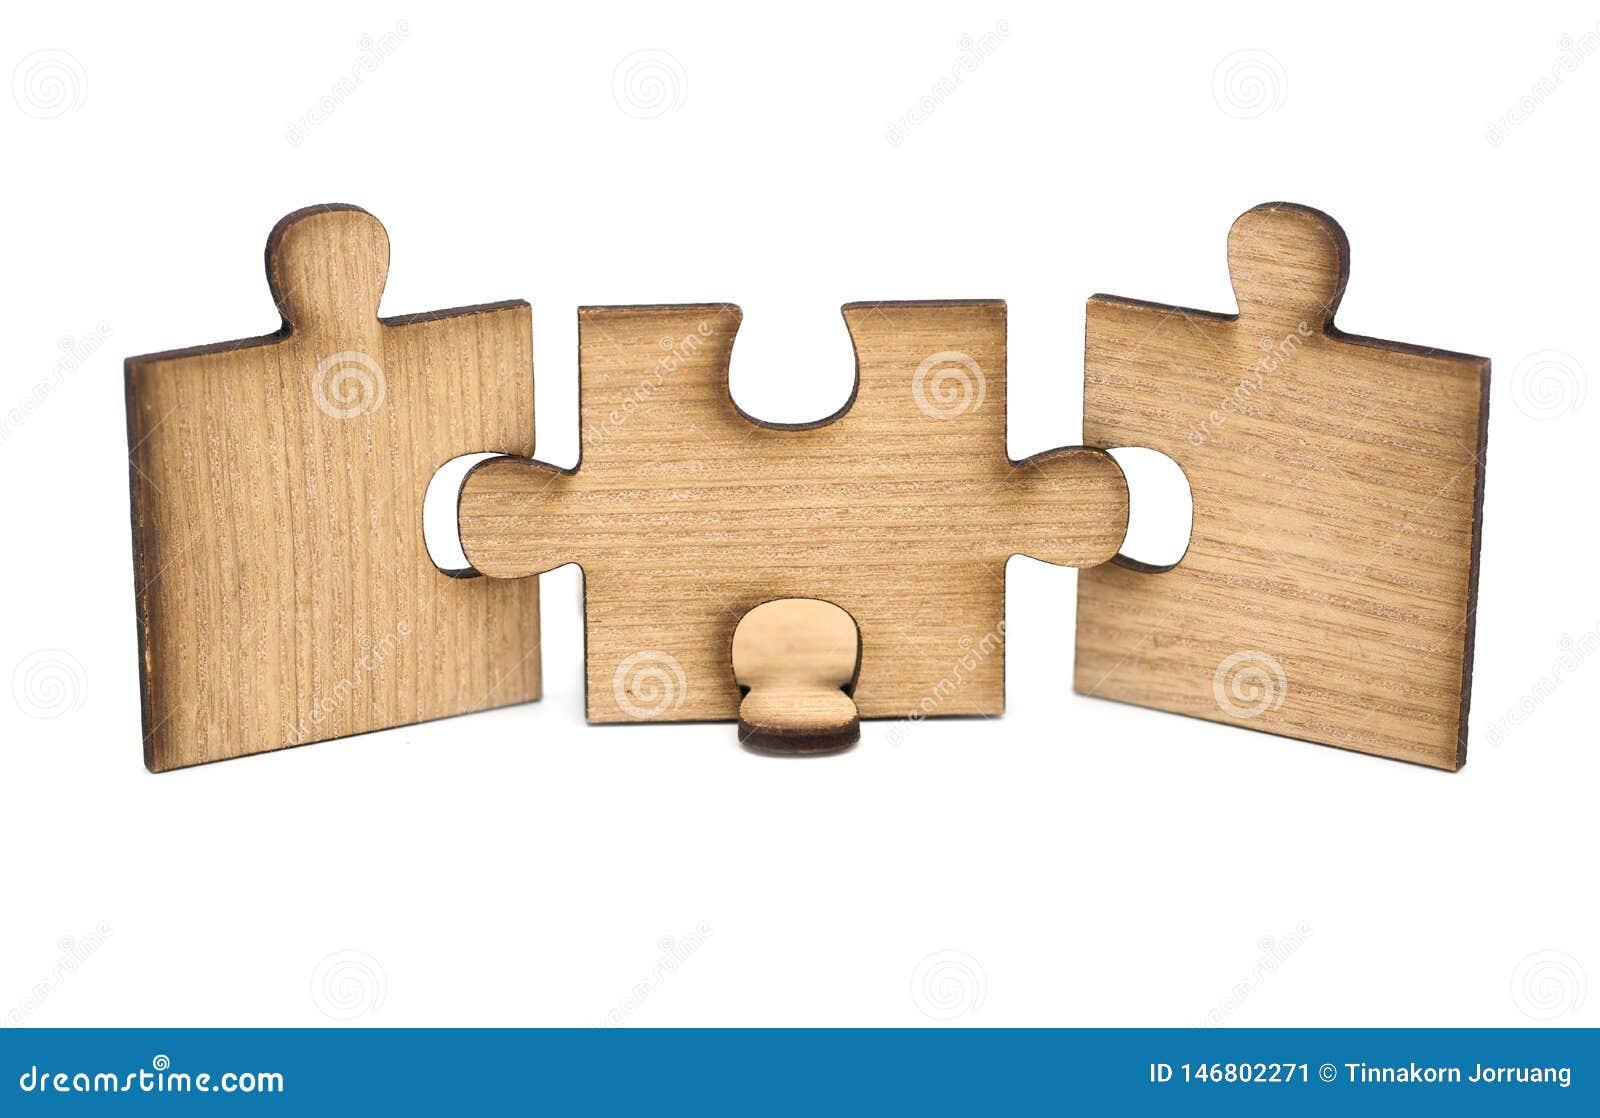 Tr?s partes de serra de vaiv?m de madeira s?o conectadas isoladas junto no fundo branco Conceito da conex?o